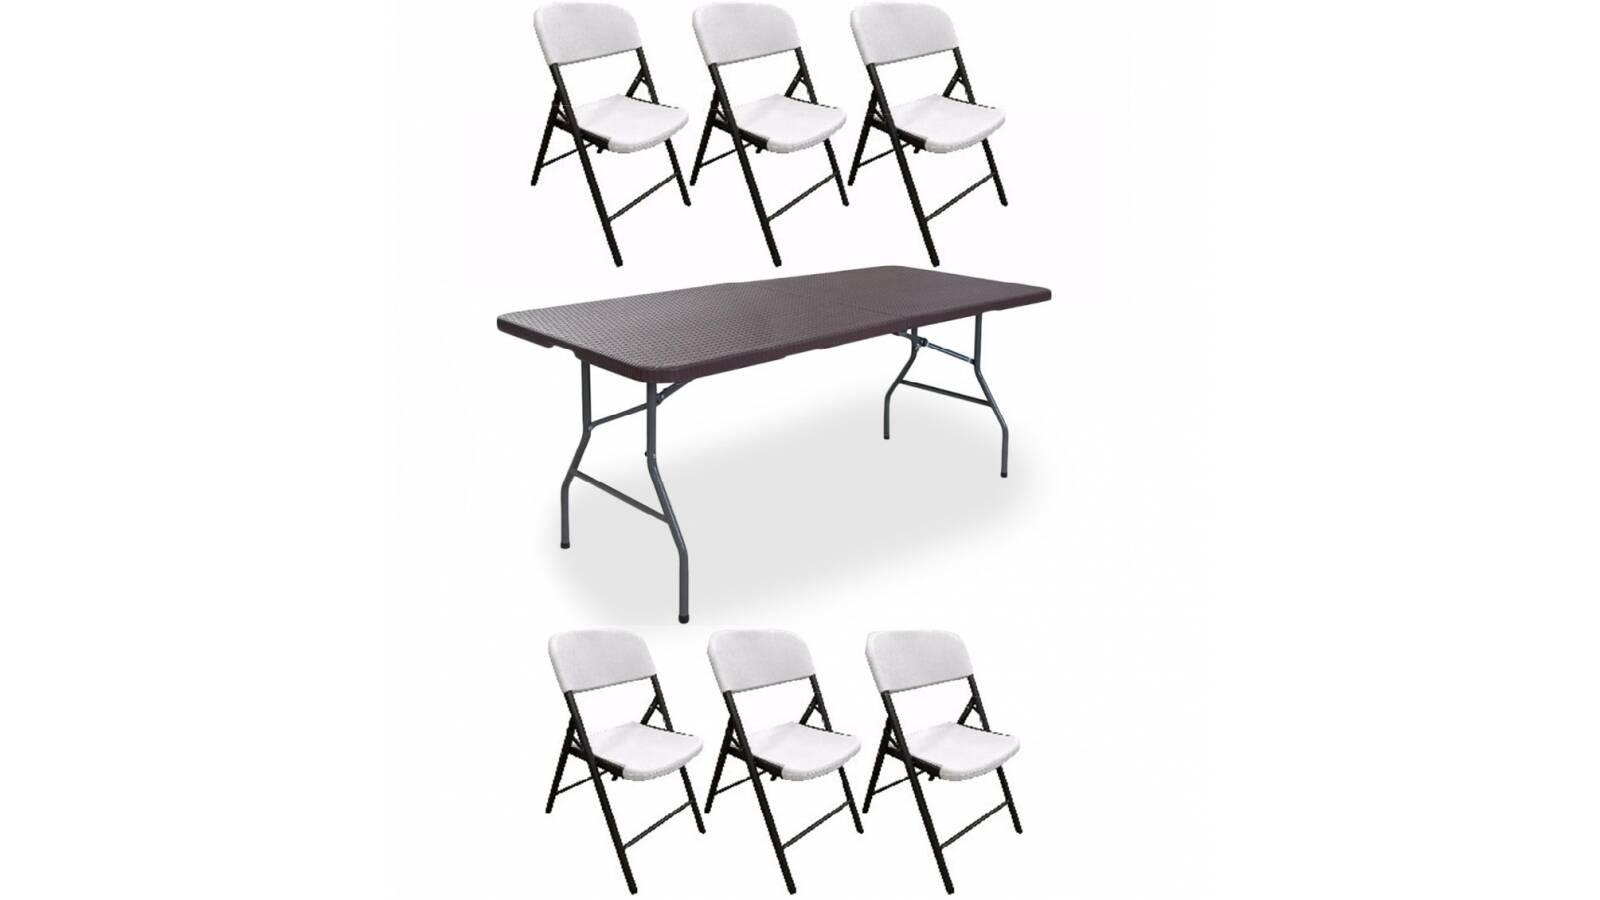 Mesa plegable 180 cm tipo Rattan + 6 sillas plegables